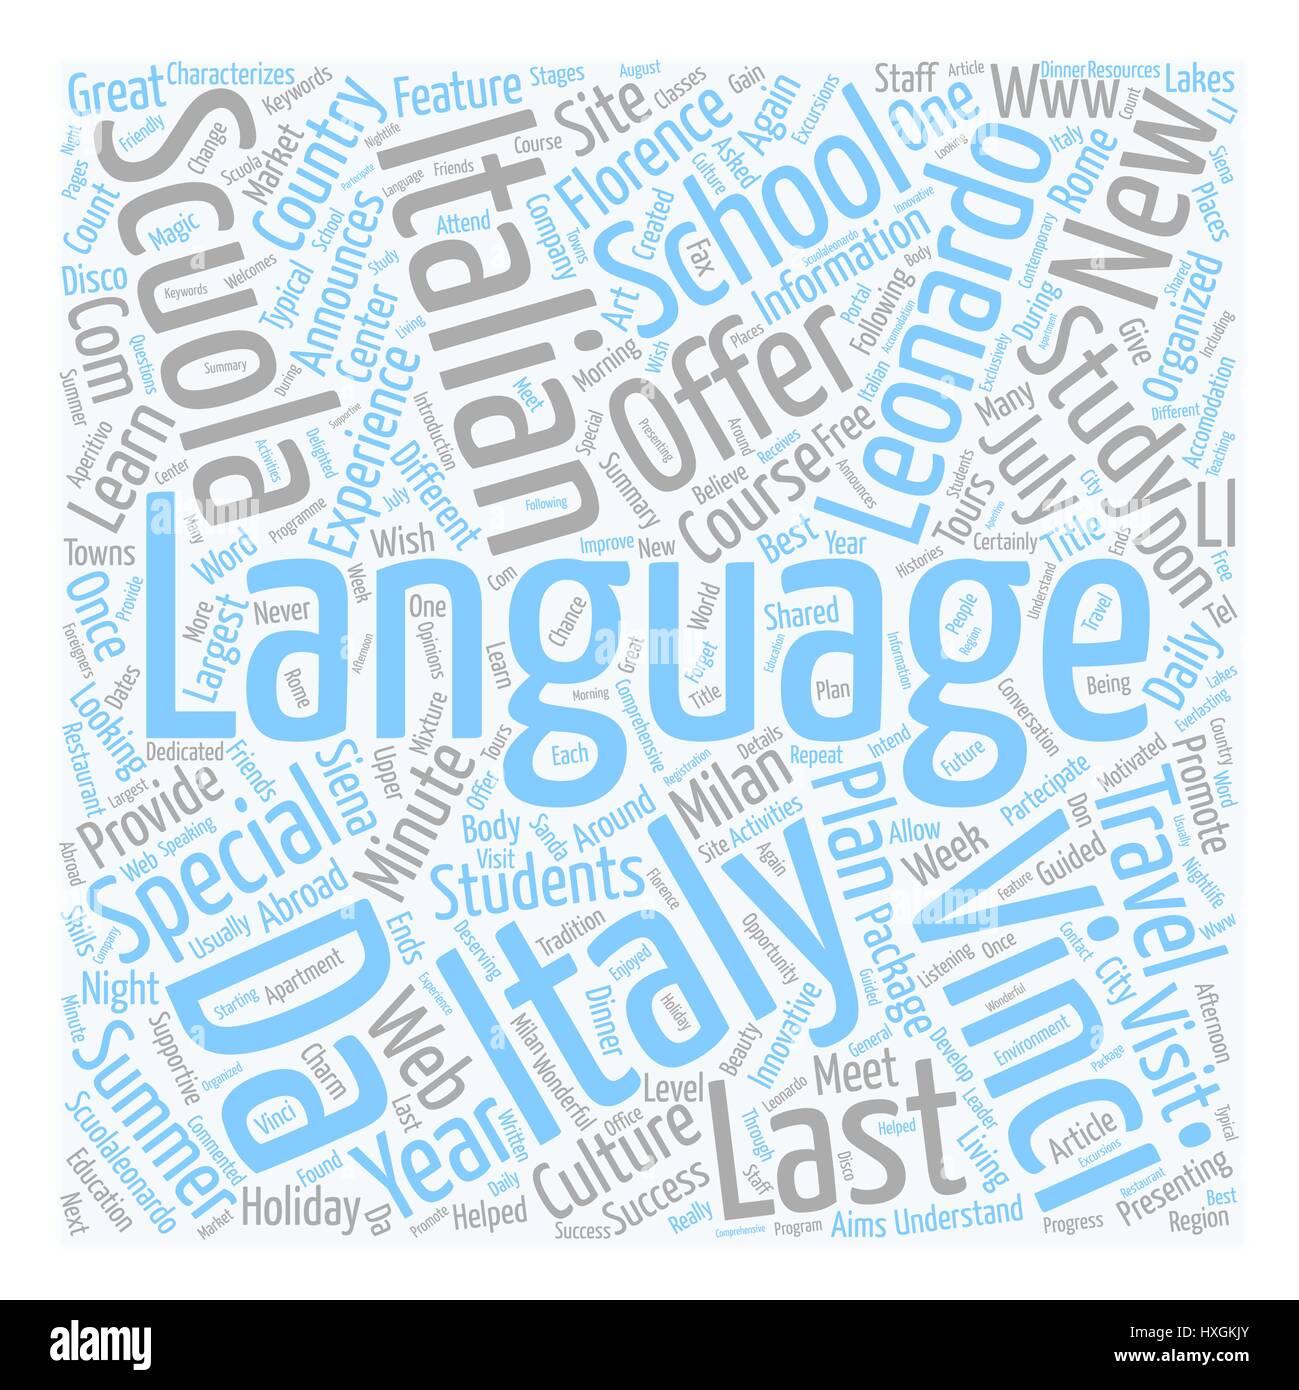 Scuola Leonardo Da Vinci Announces The New Last Minute Special Offers For Summer 2007 text background wordcloud - Stock Vector